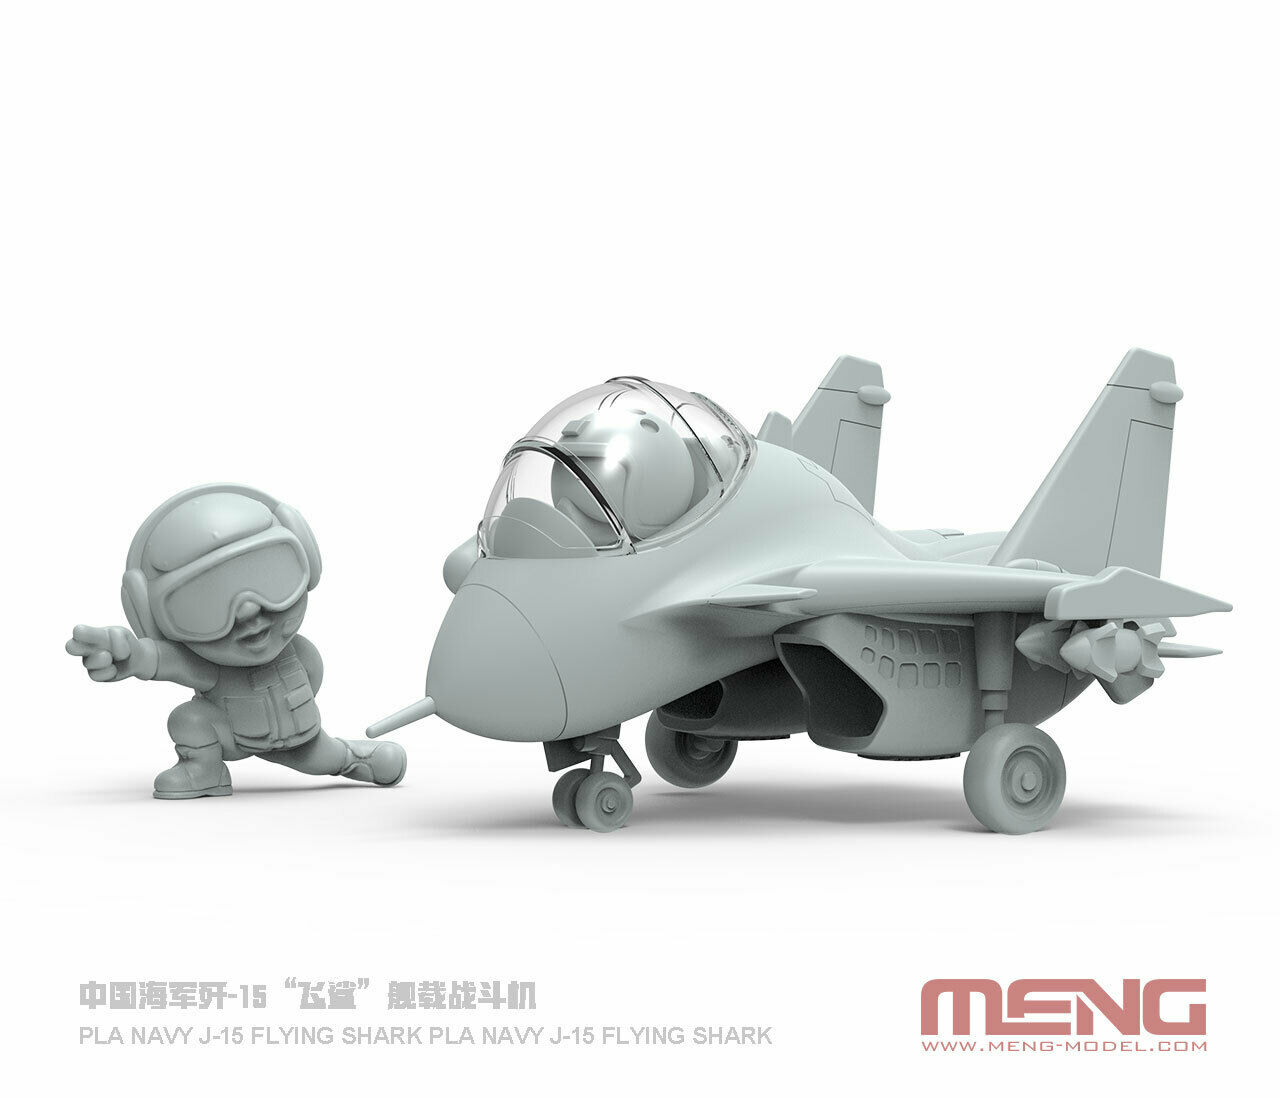 Meng Mplane-008 PLA Navy J-15 Flying Shark Carrier-based Fighter Assembly  Model for sale online   eBay